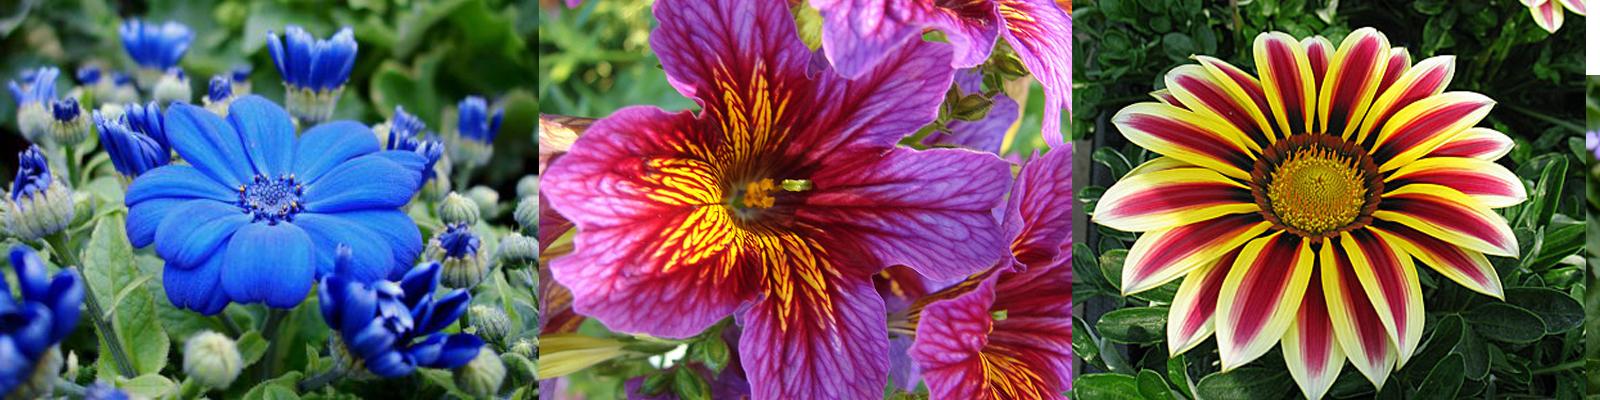 рассаду однолетних цветов